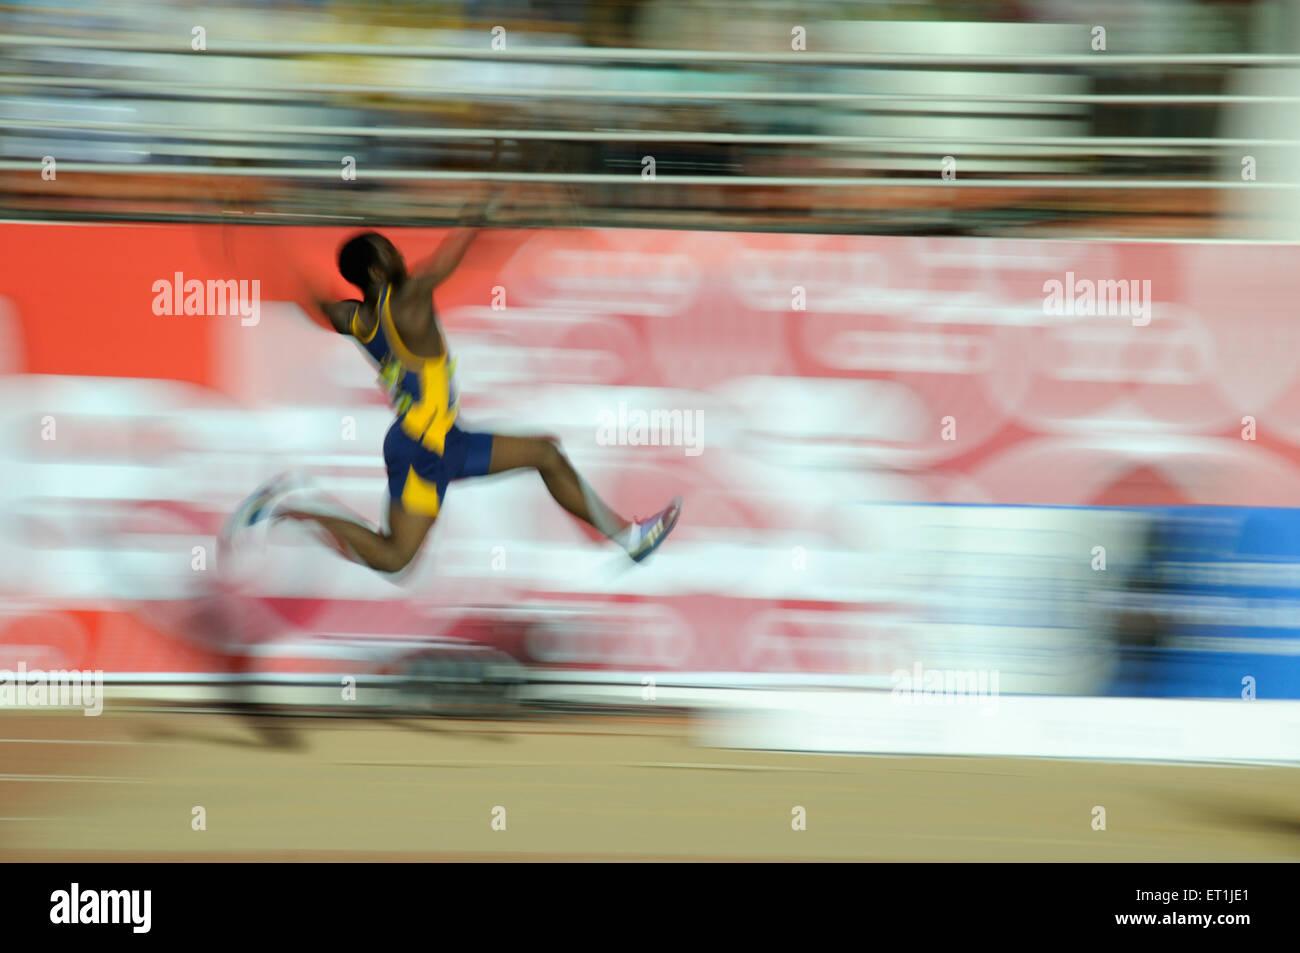 La tentative de l'athlète; saut en longueur; Pune Maharashtra; Inde 16 octobre 2008 NOMR Photo Stock